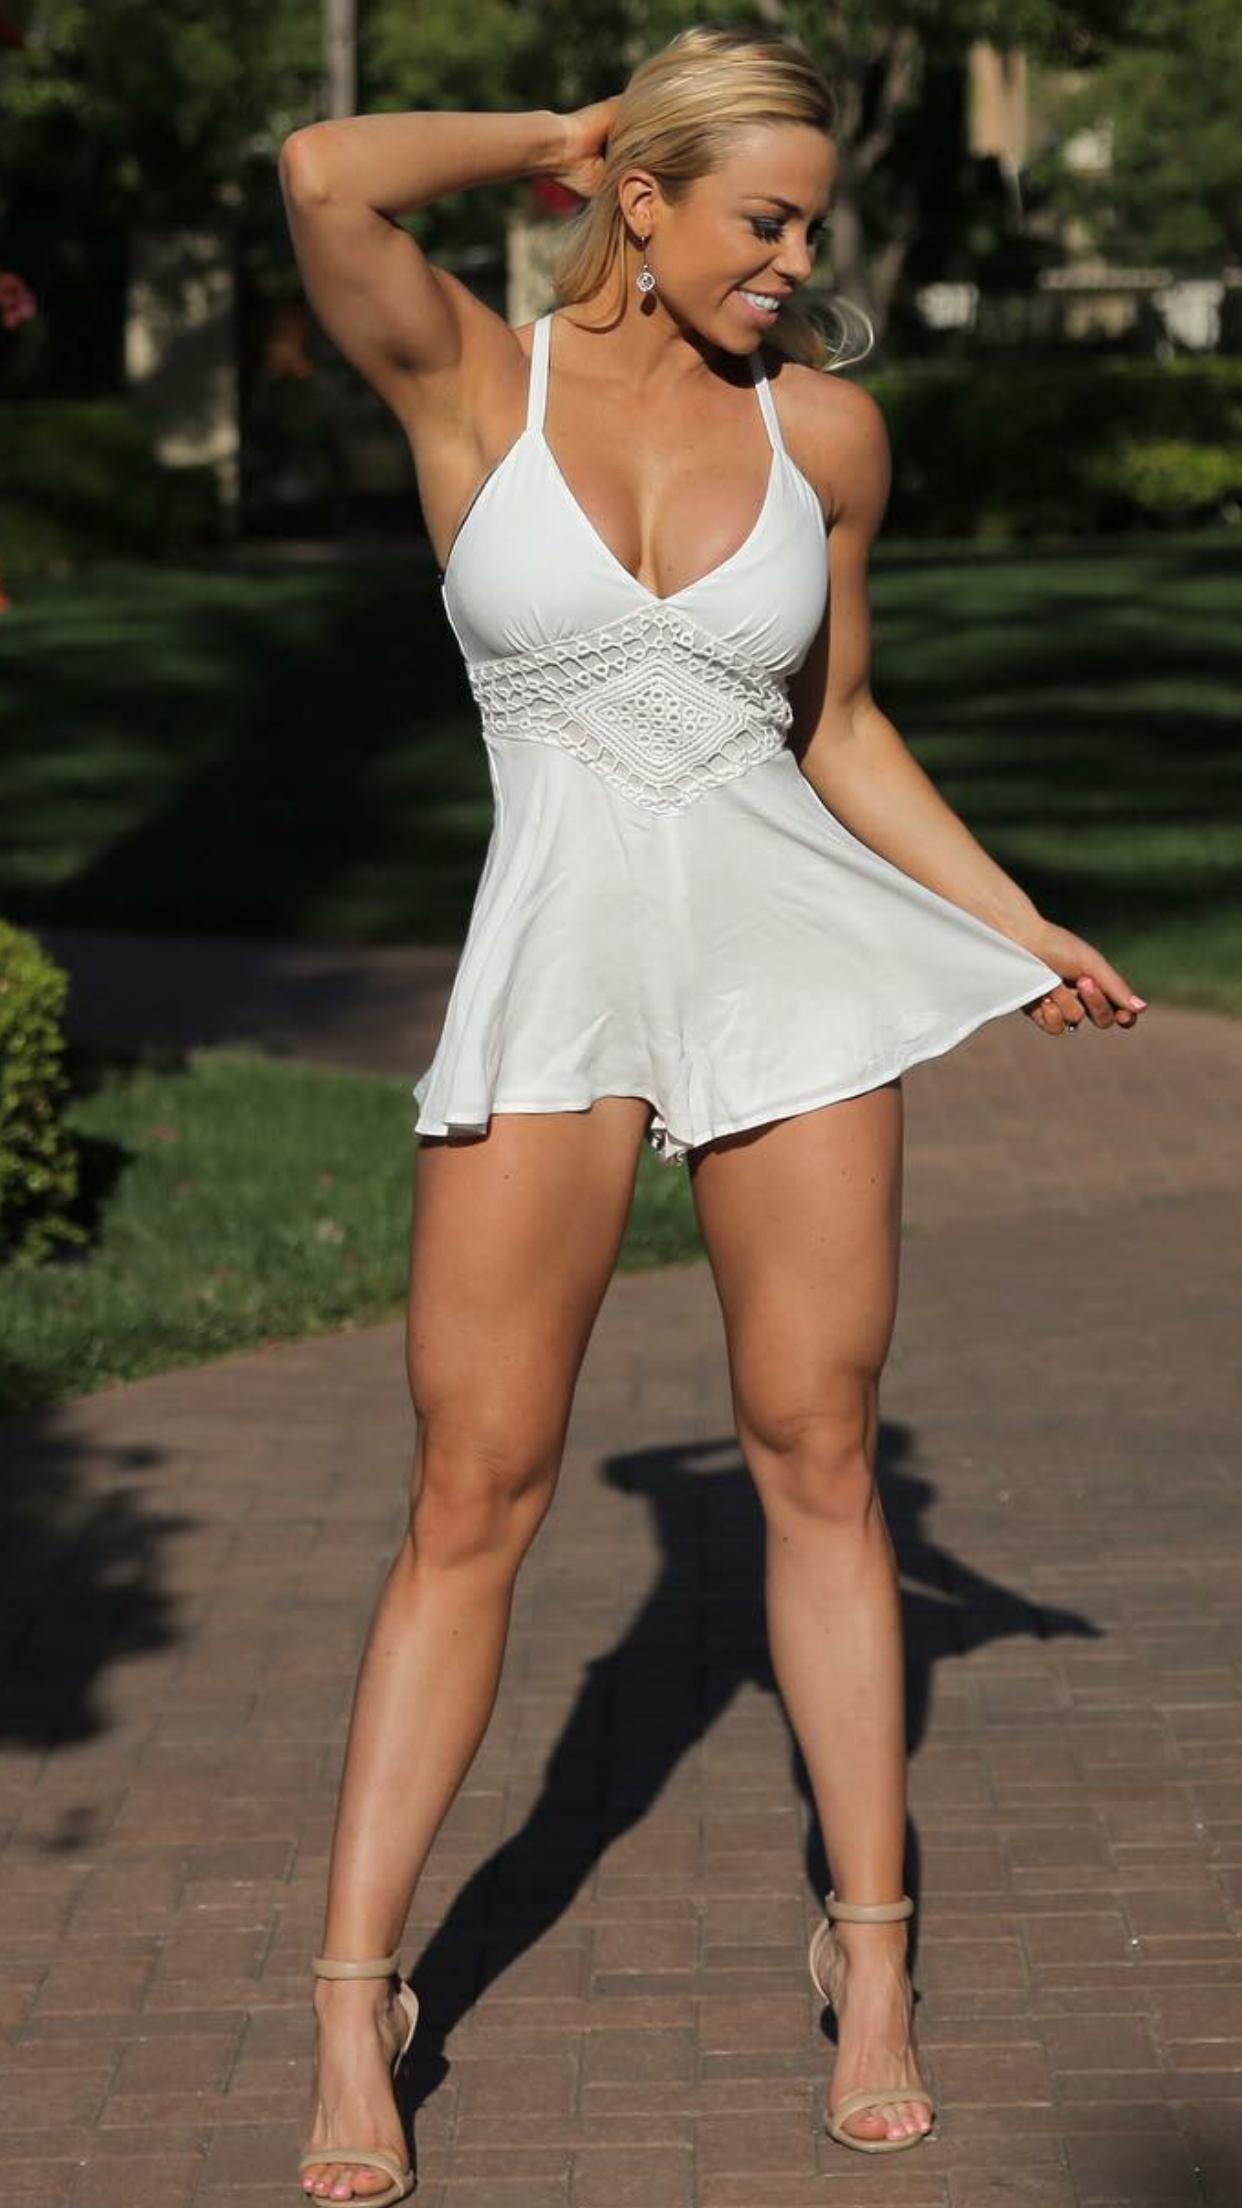 cleavage Cleavage Lauren Drain Kagan naked photo 2017